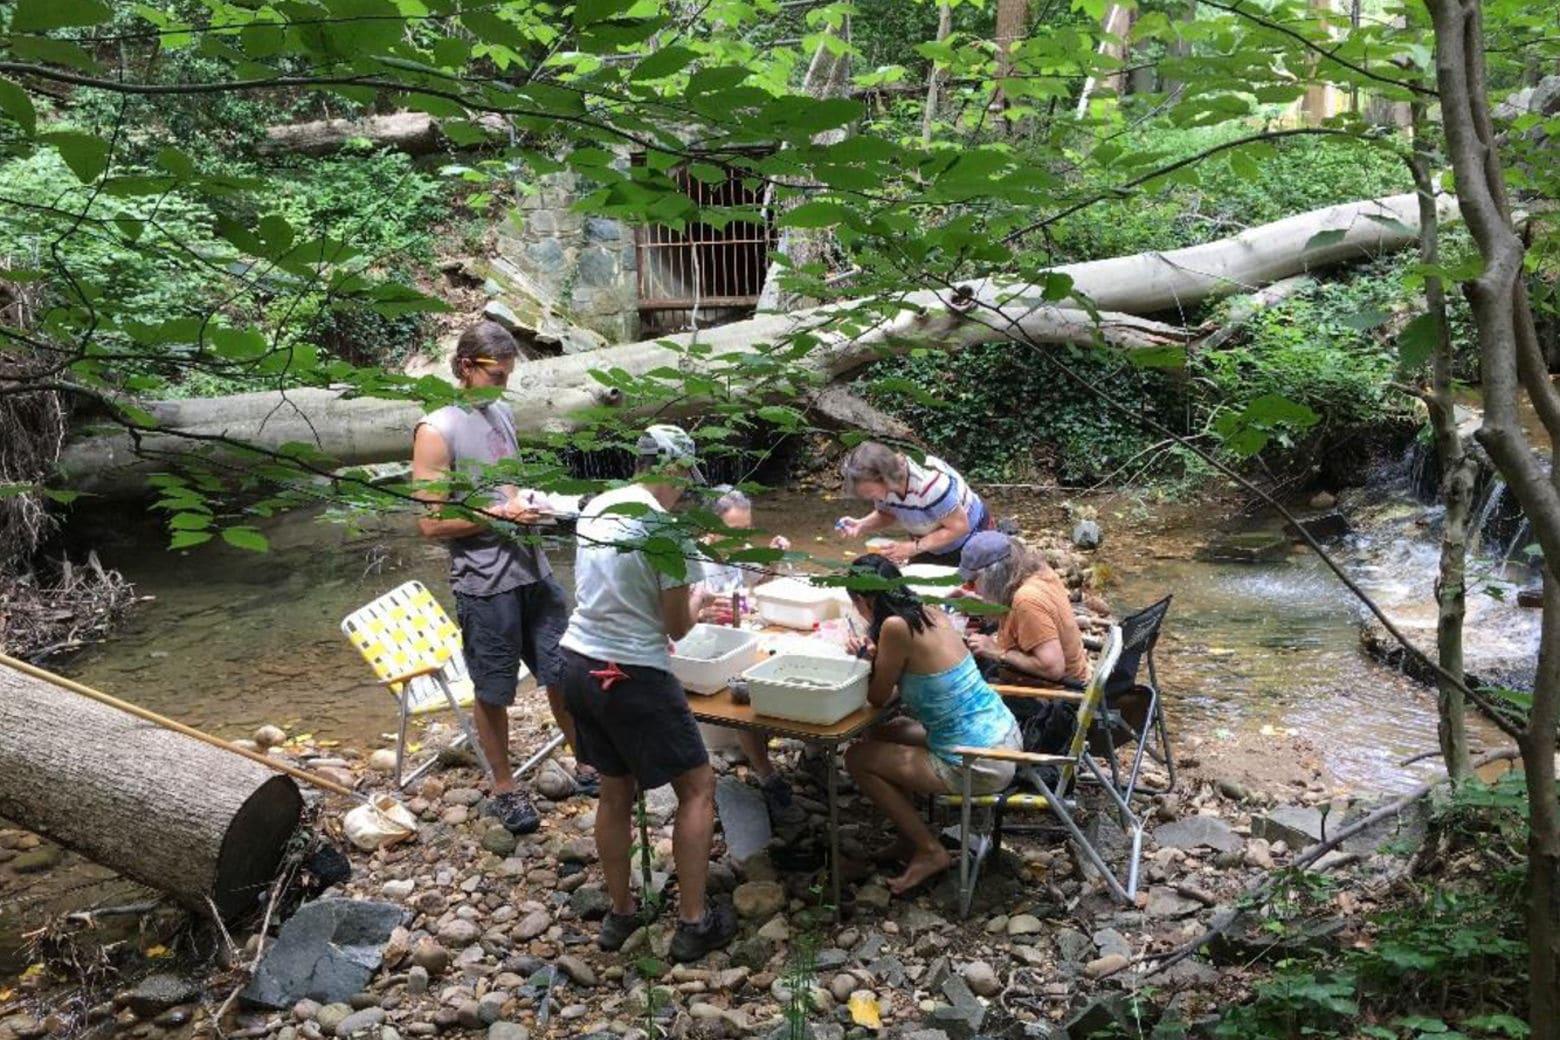 Members of the Audubon Naturalist Society gather in Rock Creek Park. (Audubon Naturalist Society)